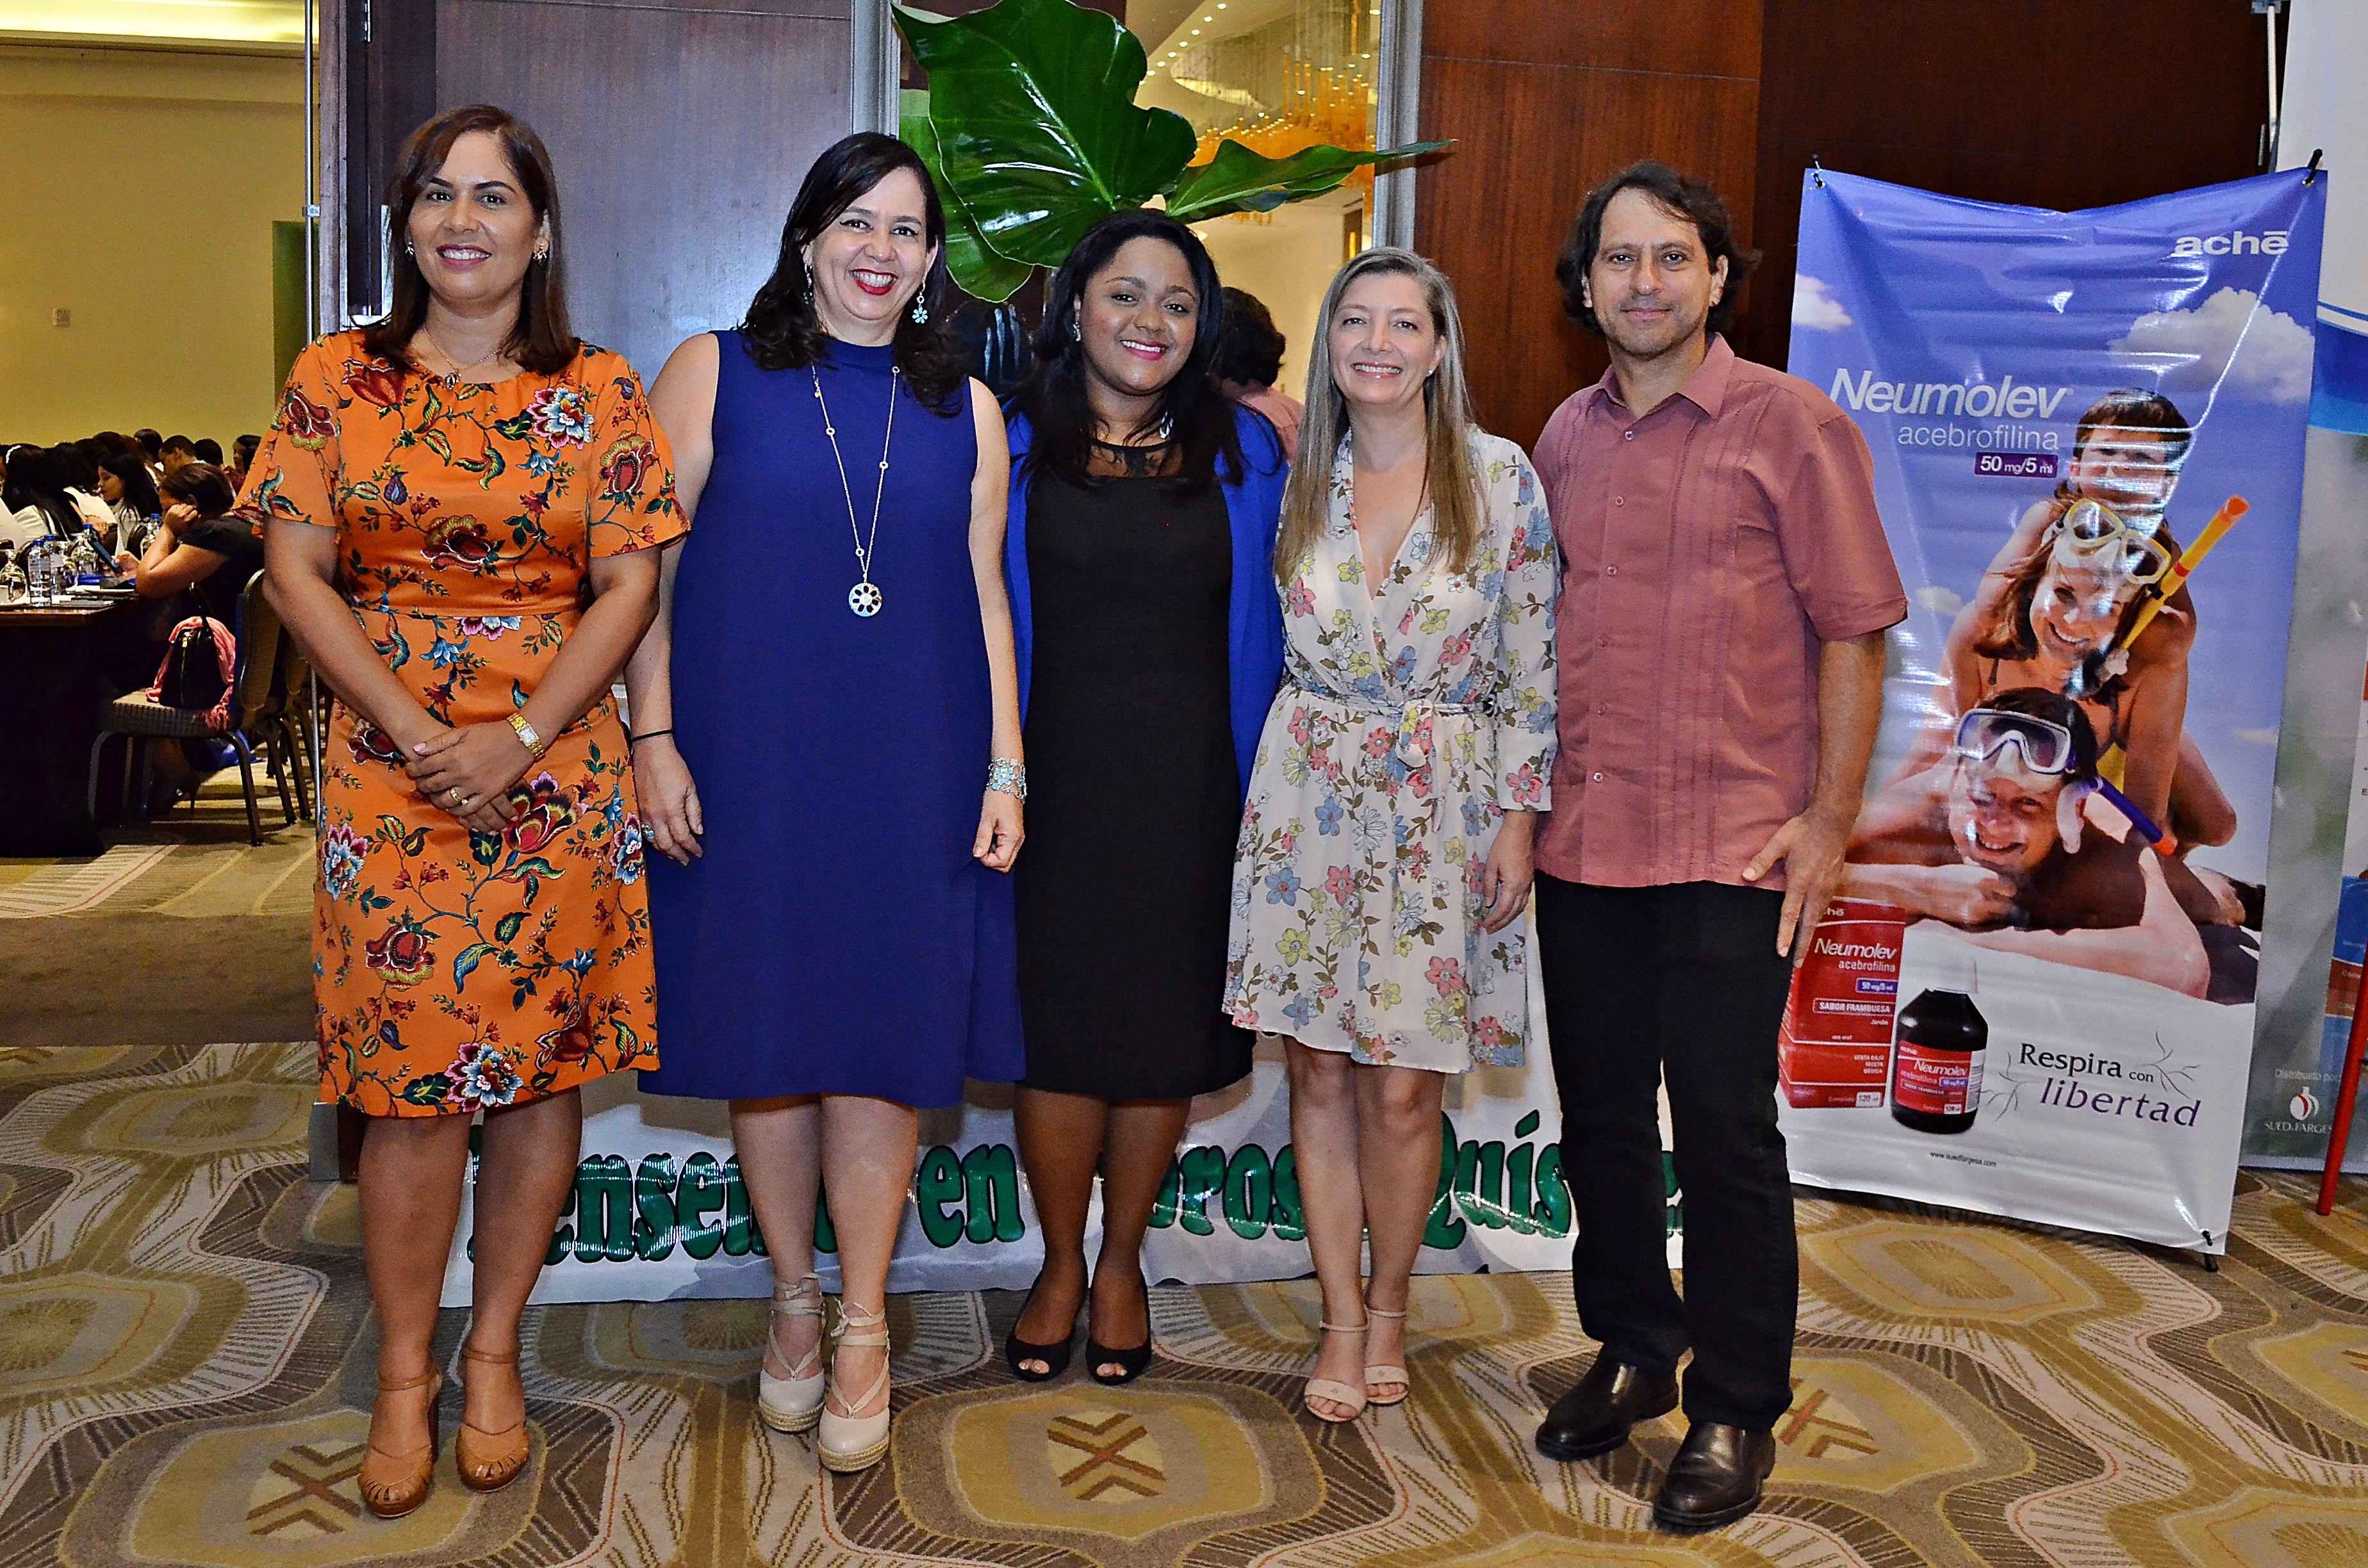 Alexandra Tabar, Leandra Cordero Oñate, Ana Uribe, Amy Hoepker y Jose Pablo Gutiérrez.